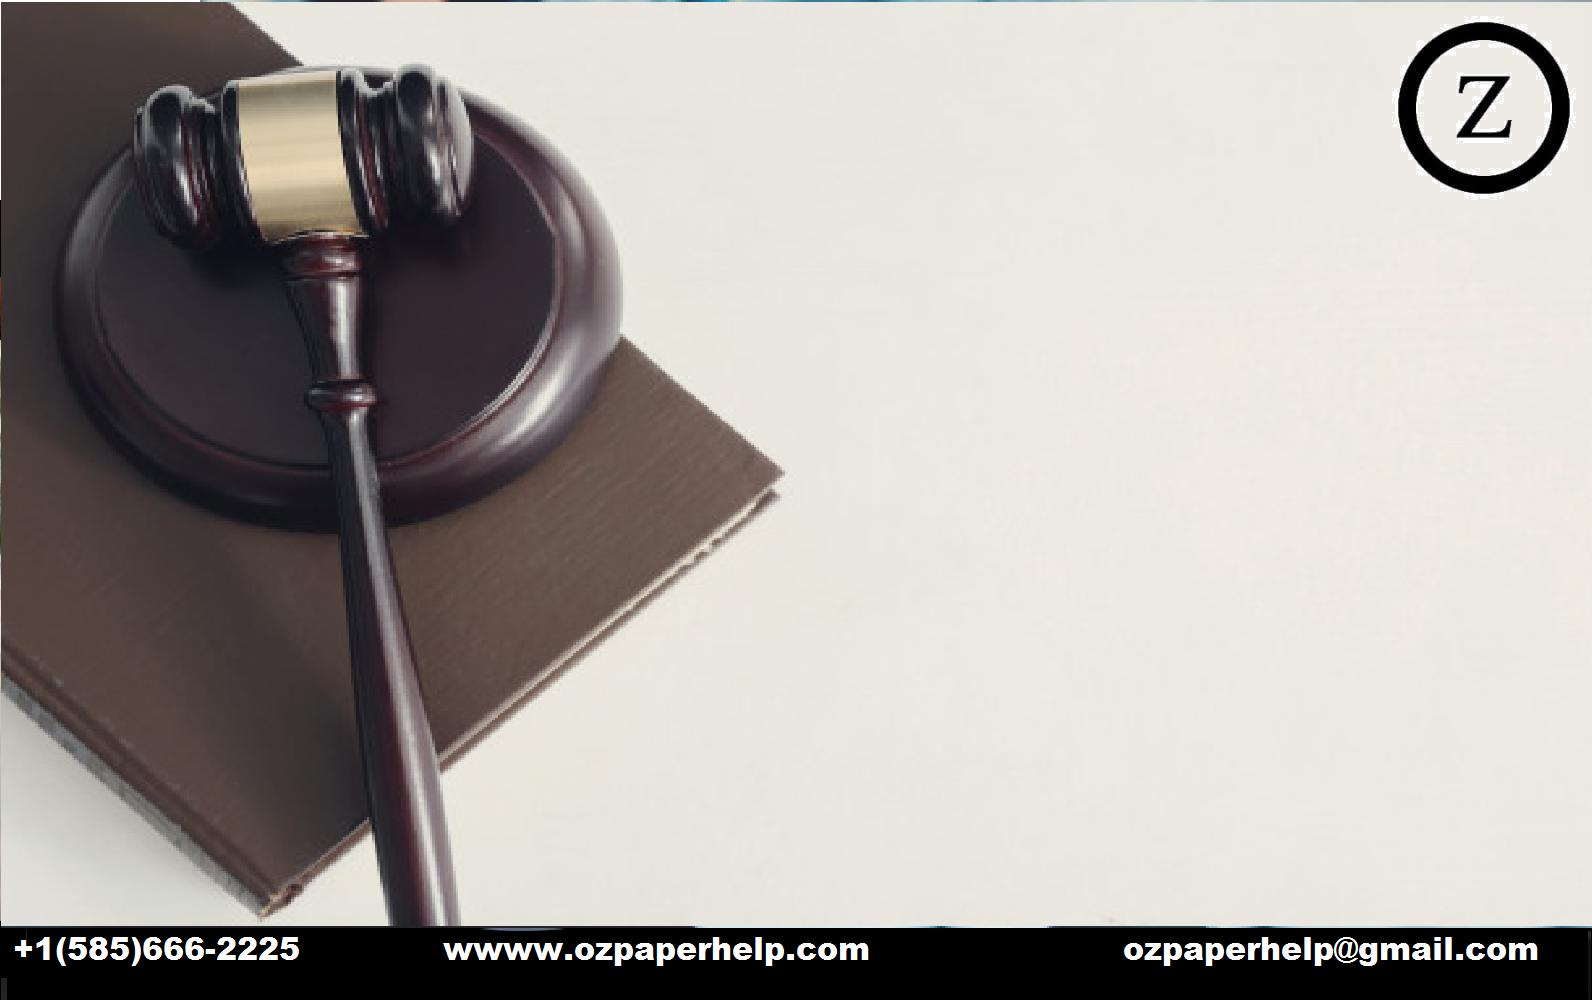 HI6027 BUSINESS & CORPORATIONS LAW Assighnment Help